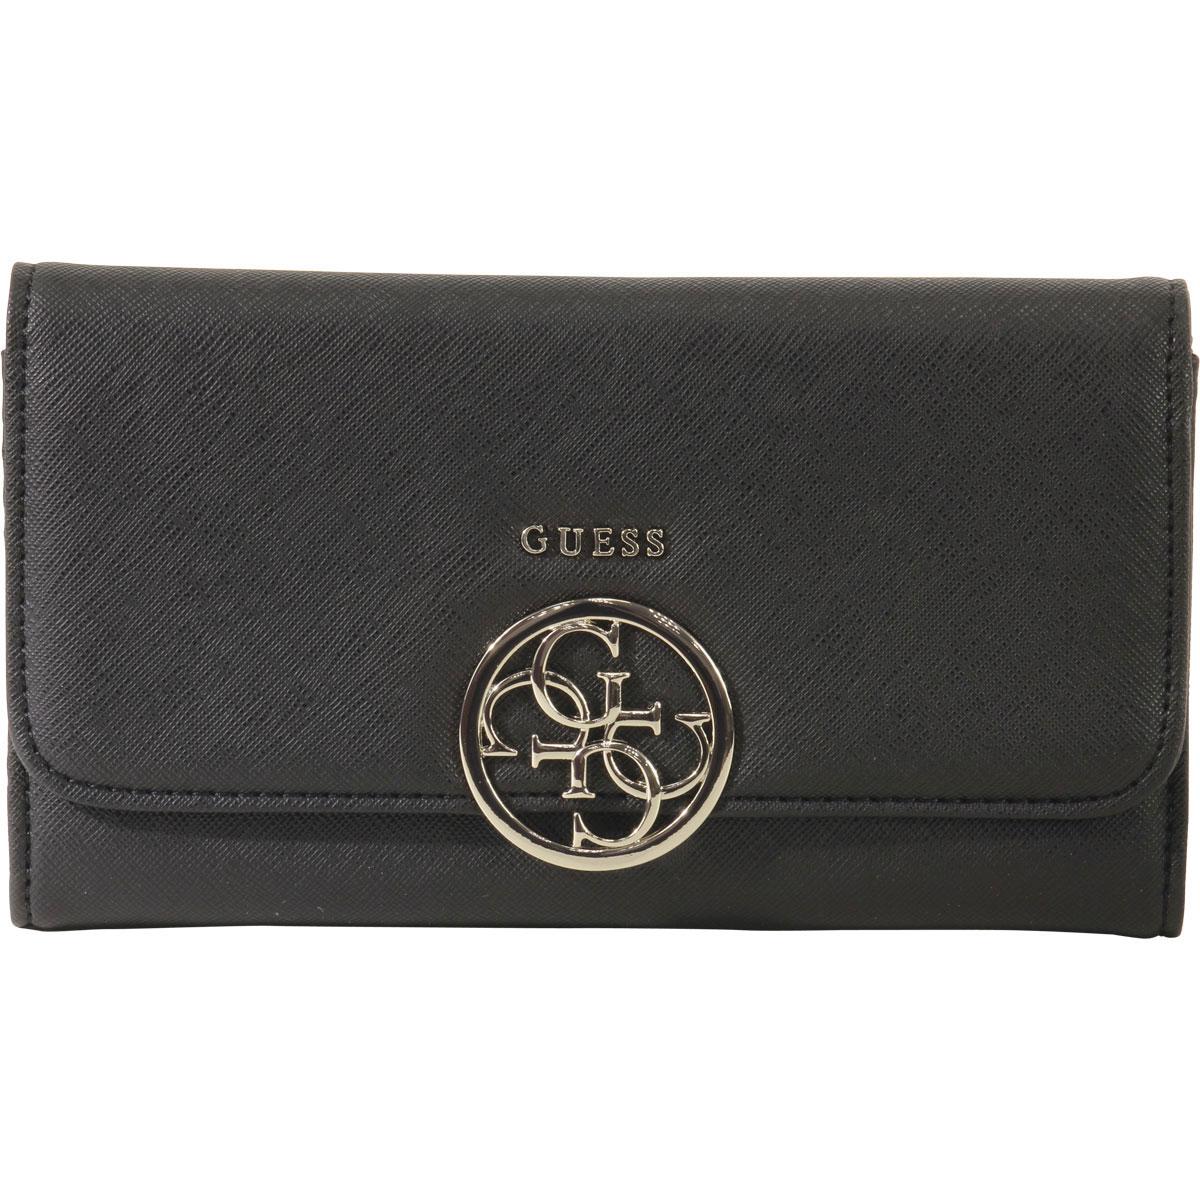 Details about Guess Women's Kamryn Saffiano Multi Clutch Wallet